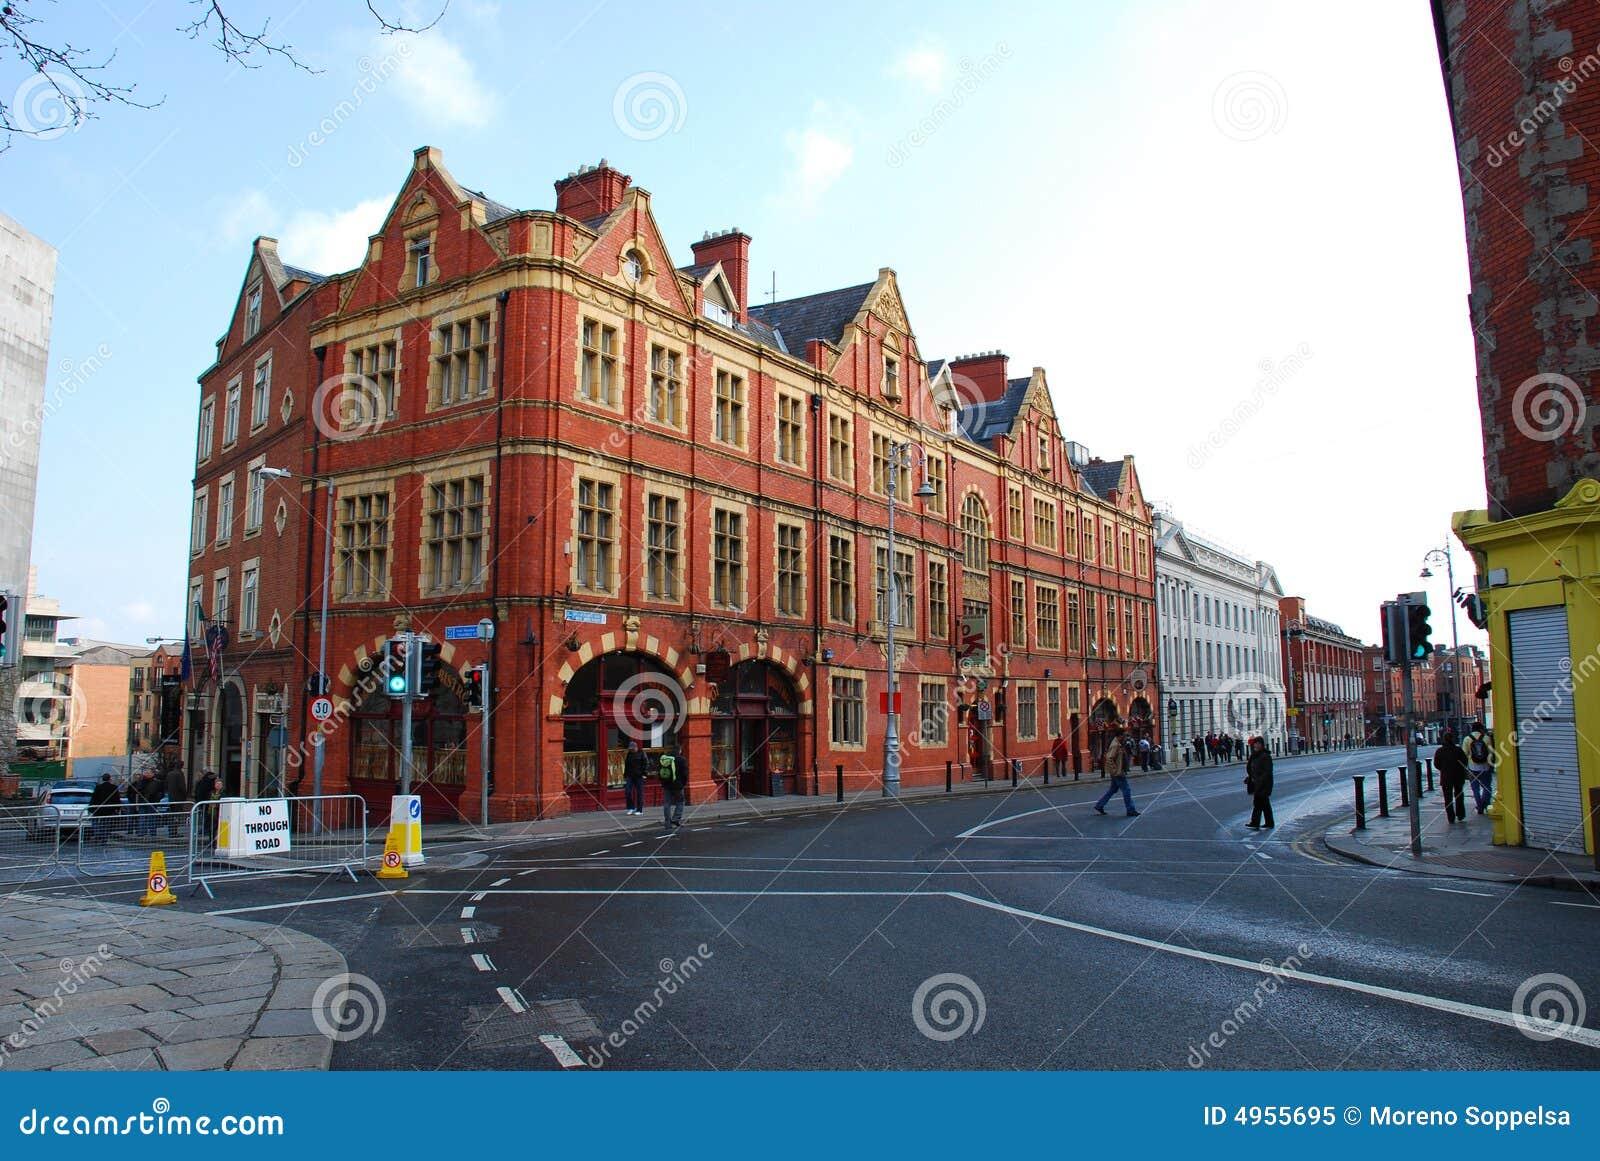 Calle de Dublín